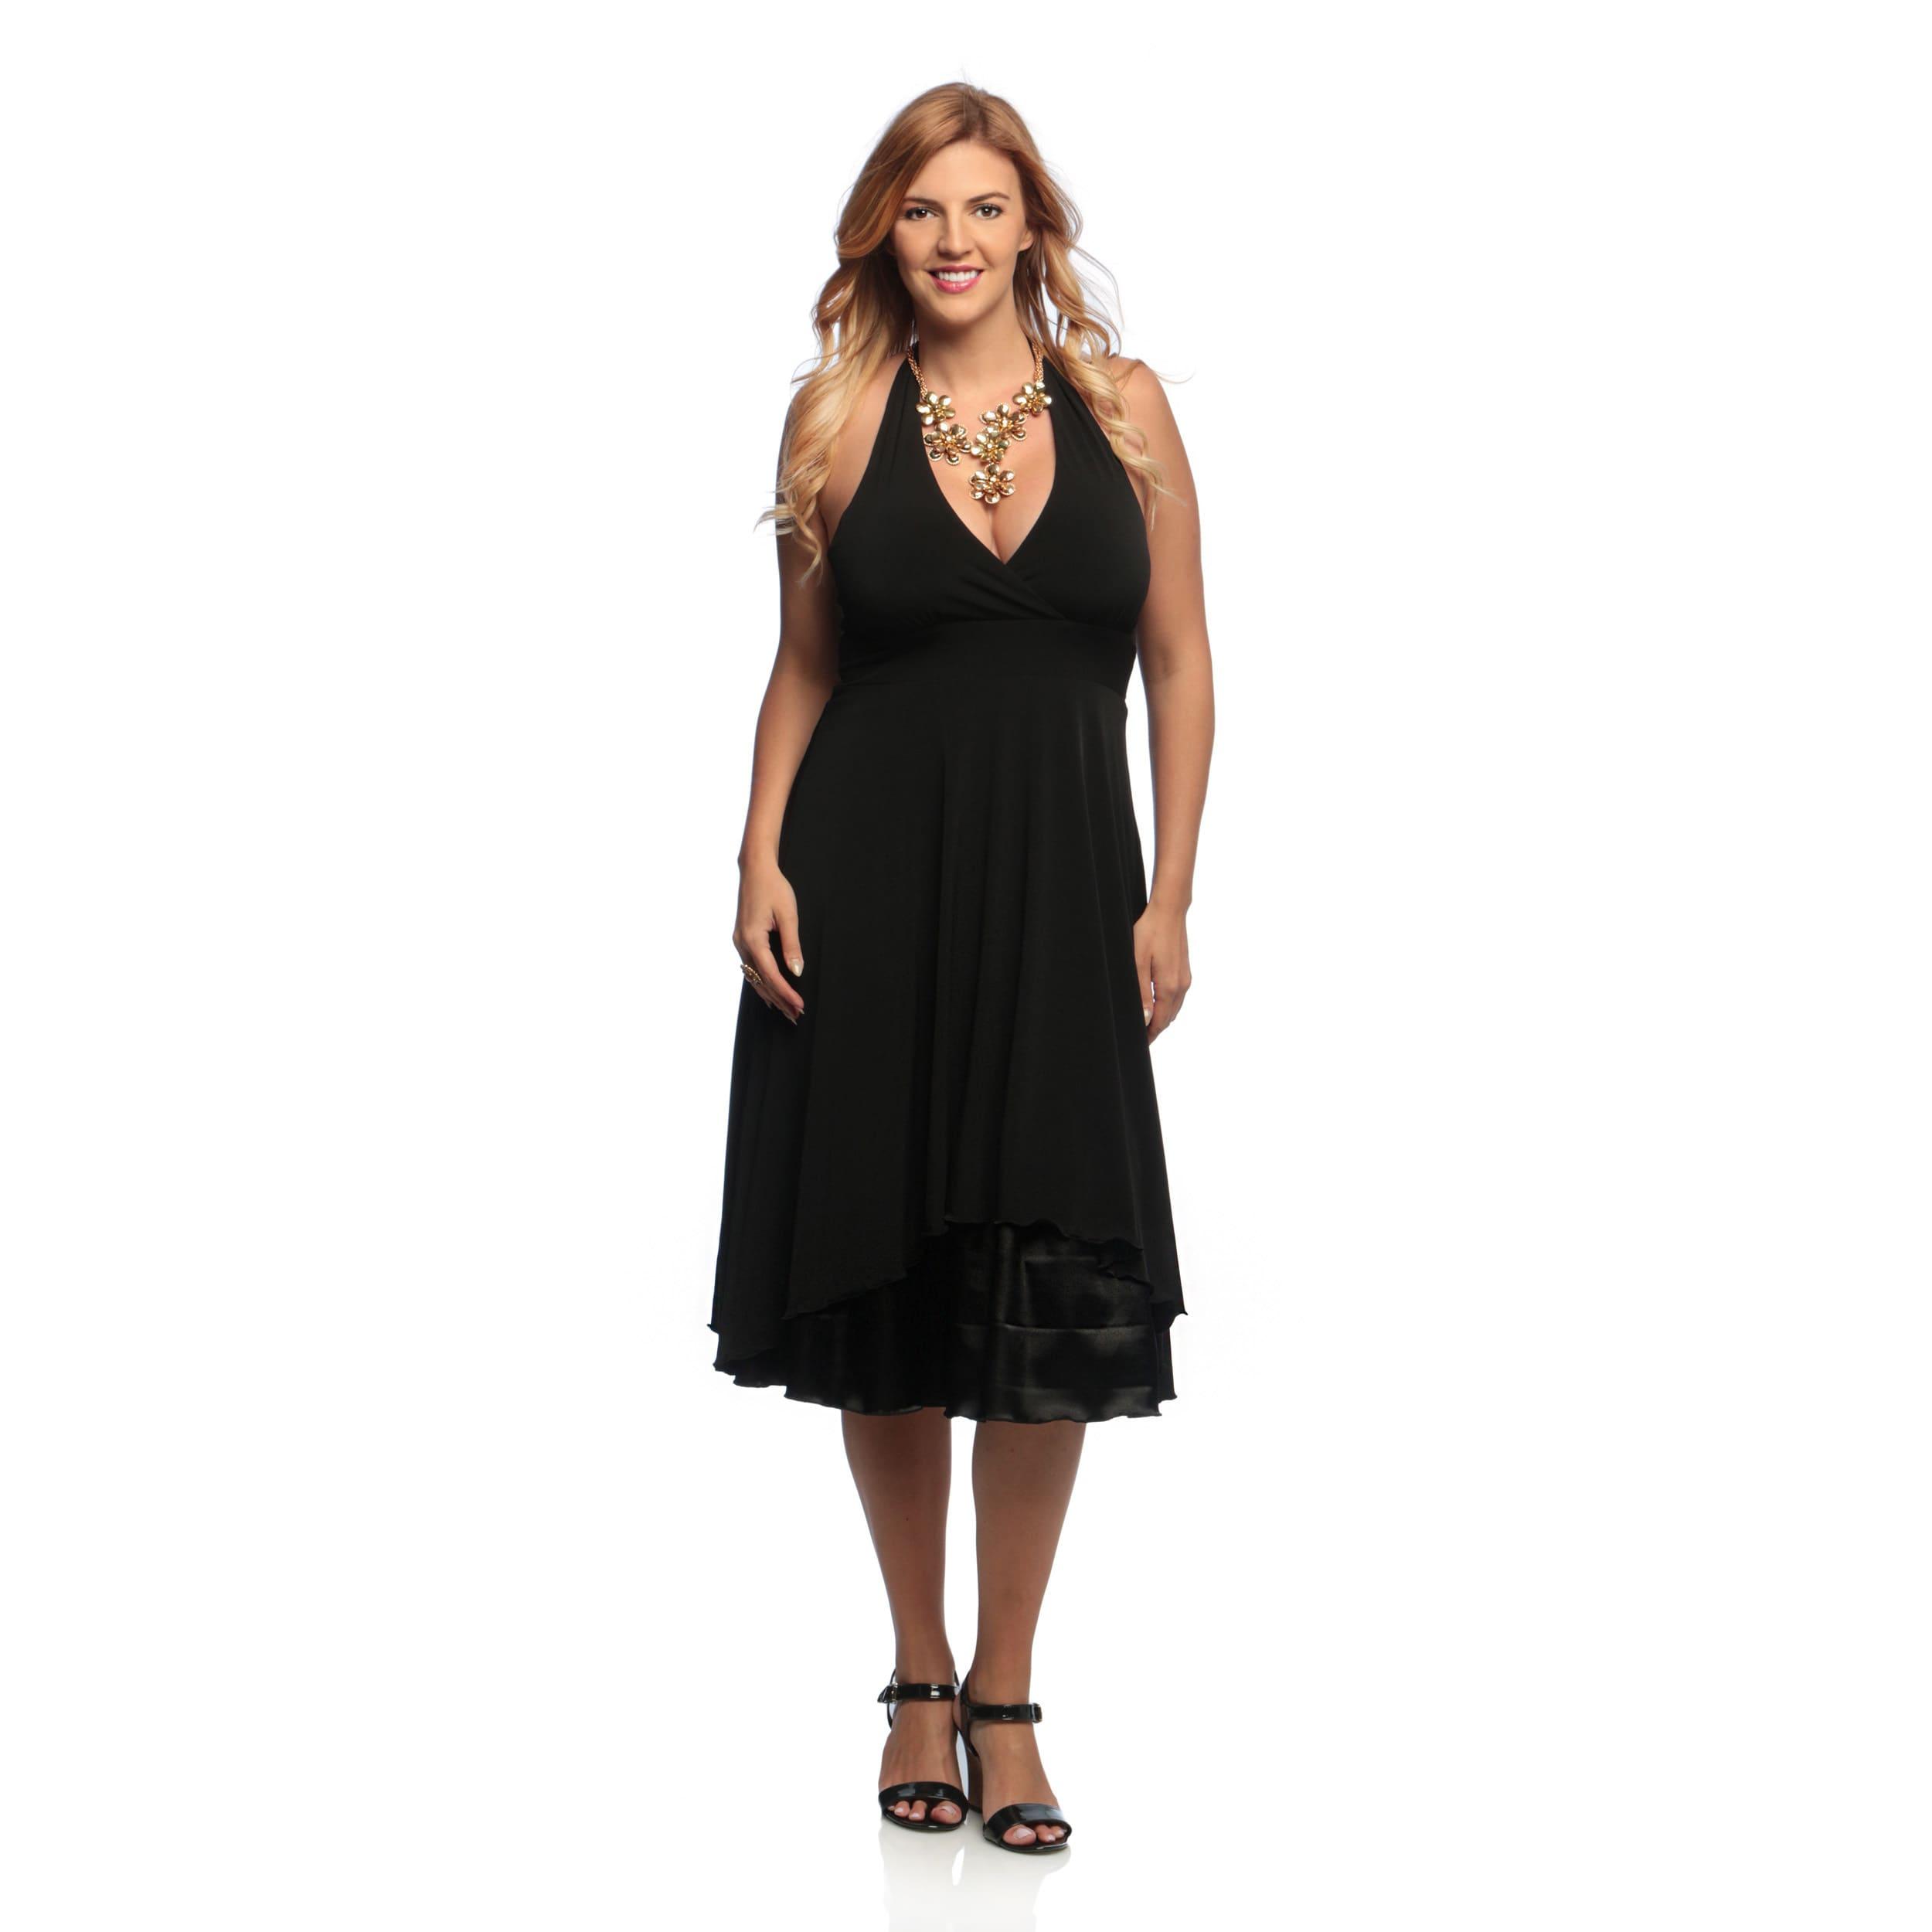 Shop Evanese Women\'s Plus Size Black Halter Neck Dress - Free ...